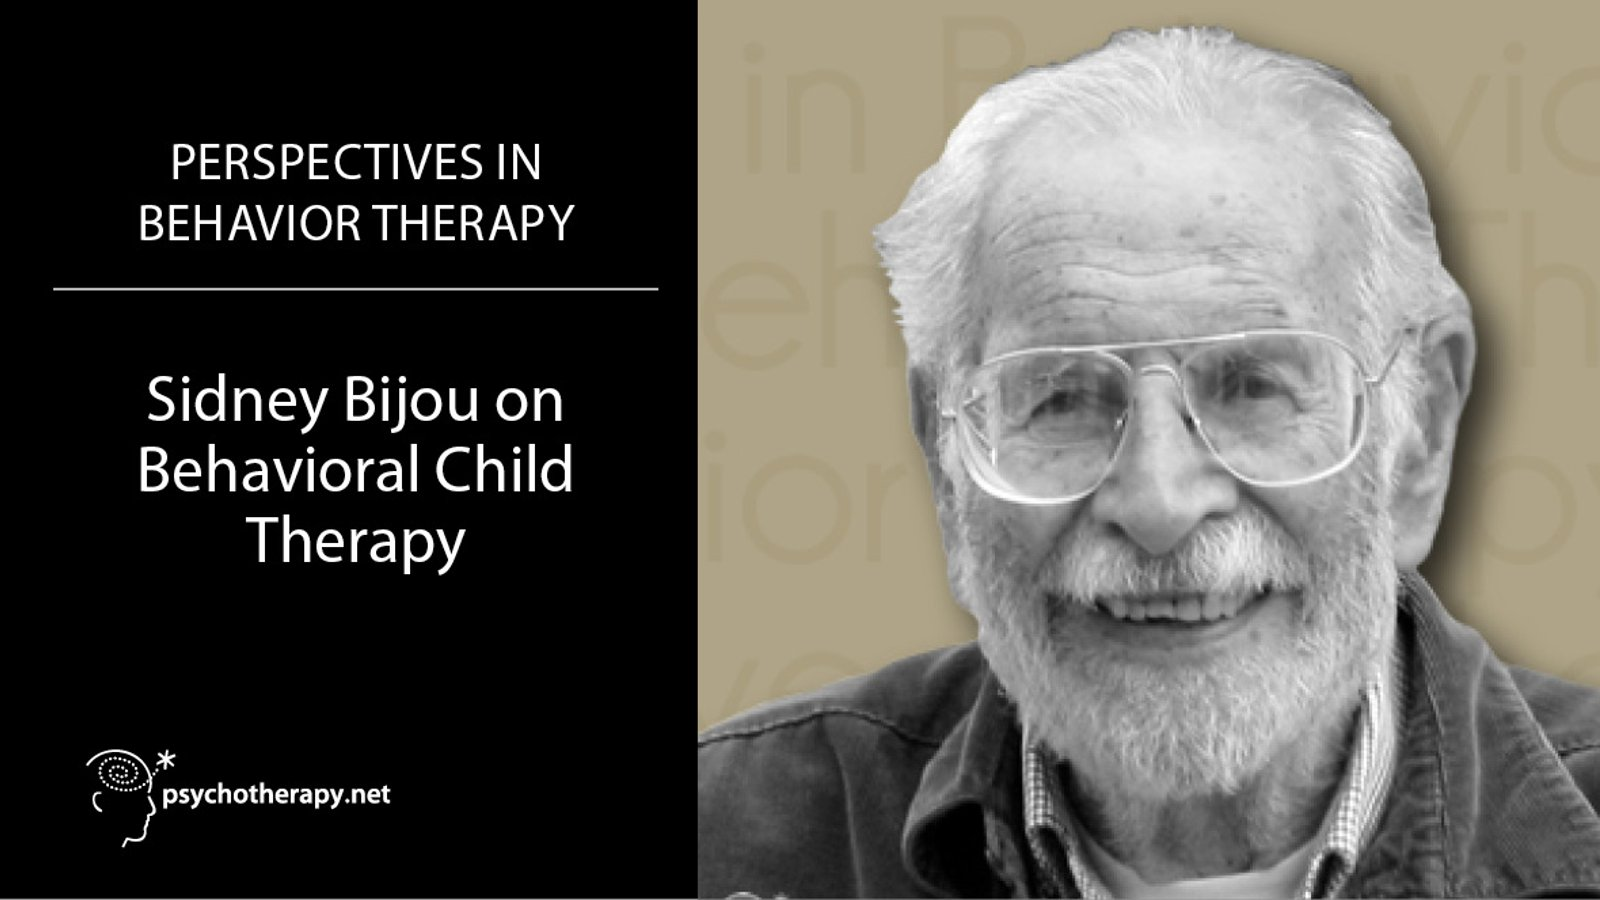 Sidney Bijou on Behavioral Child Therapy